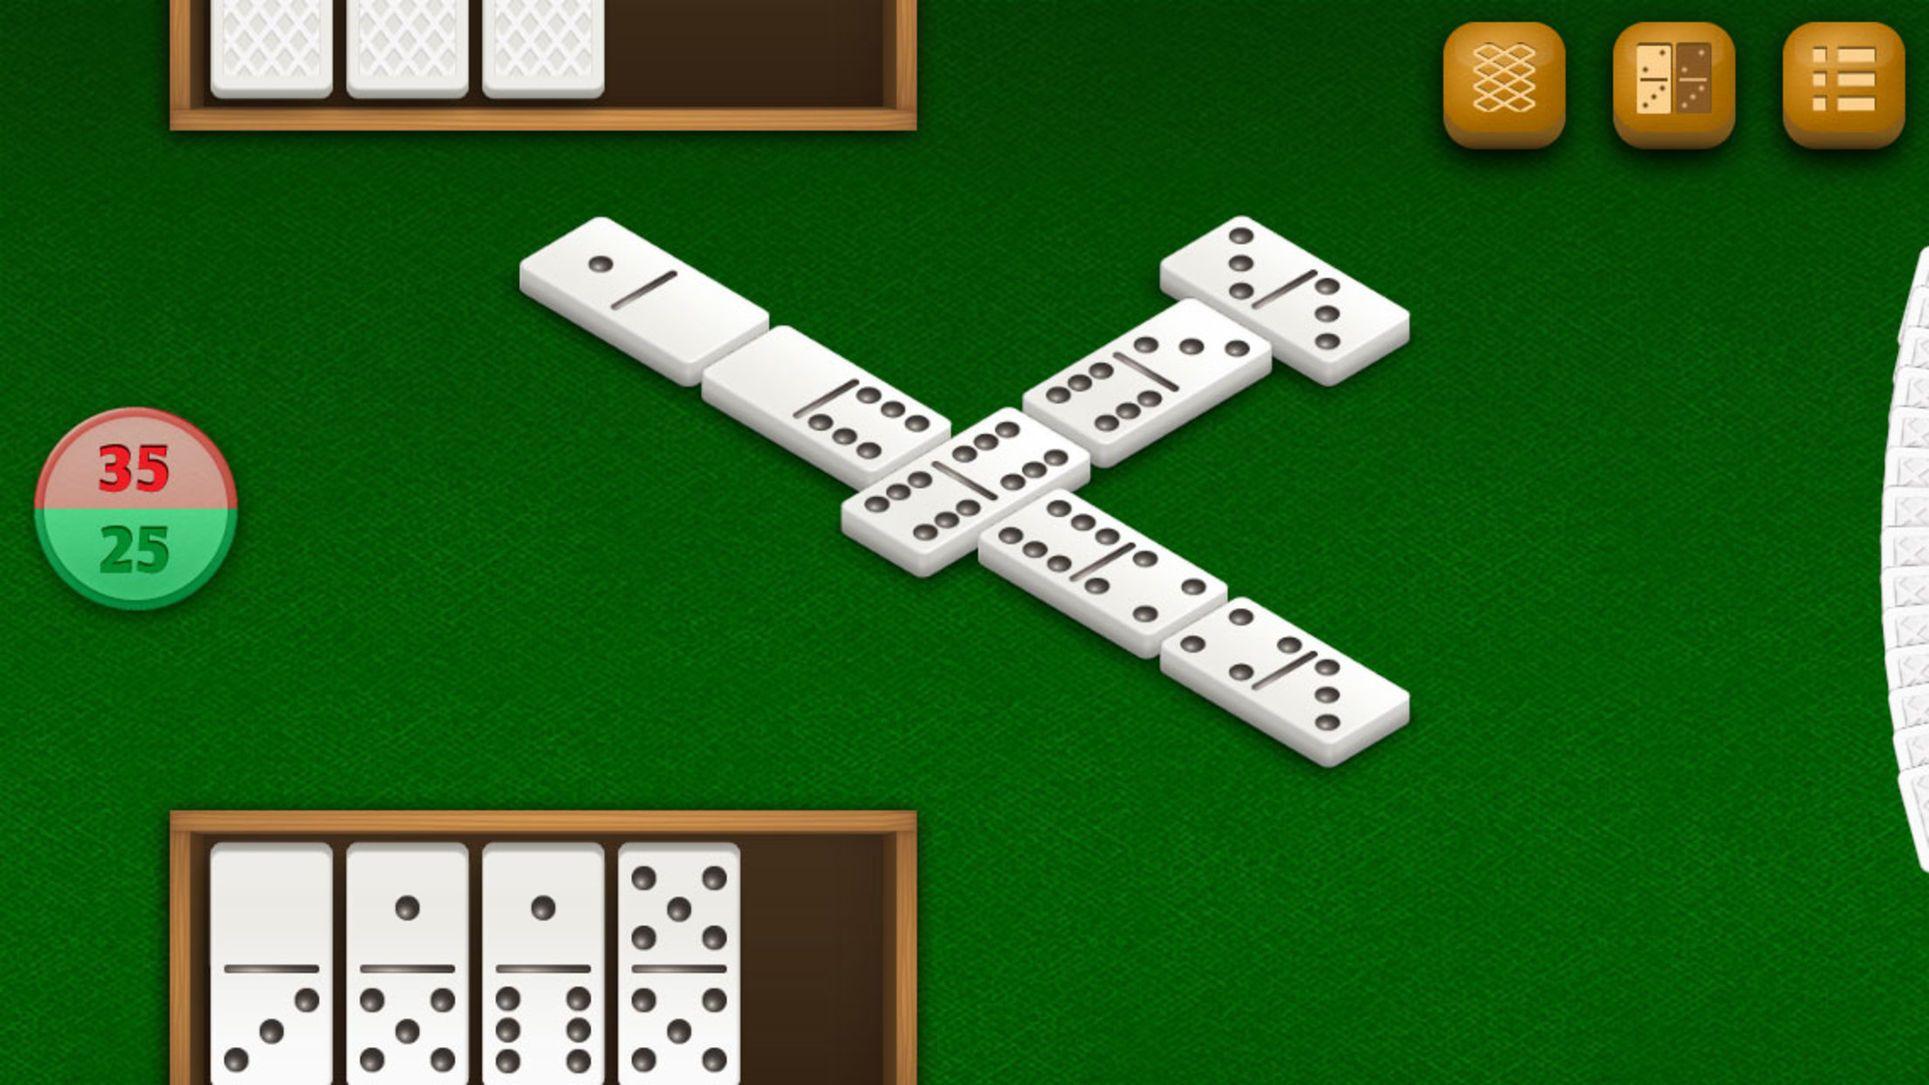 Dominos FamilyEntertainmentappsios Game, Điện thoại